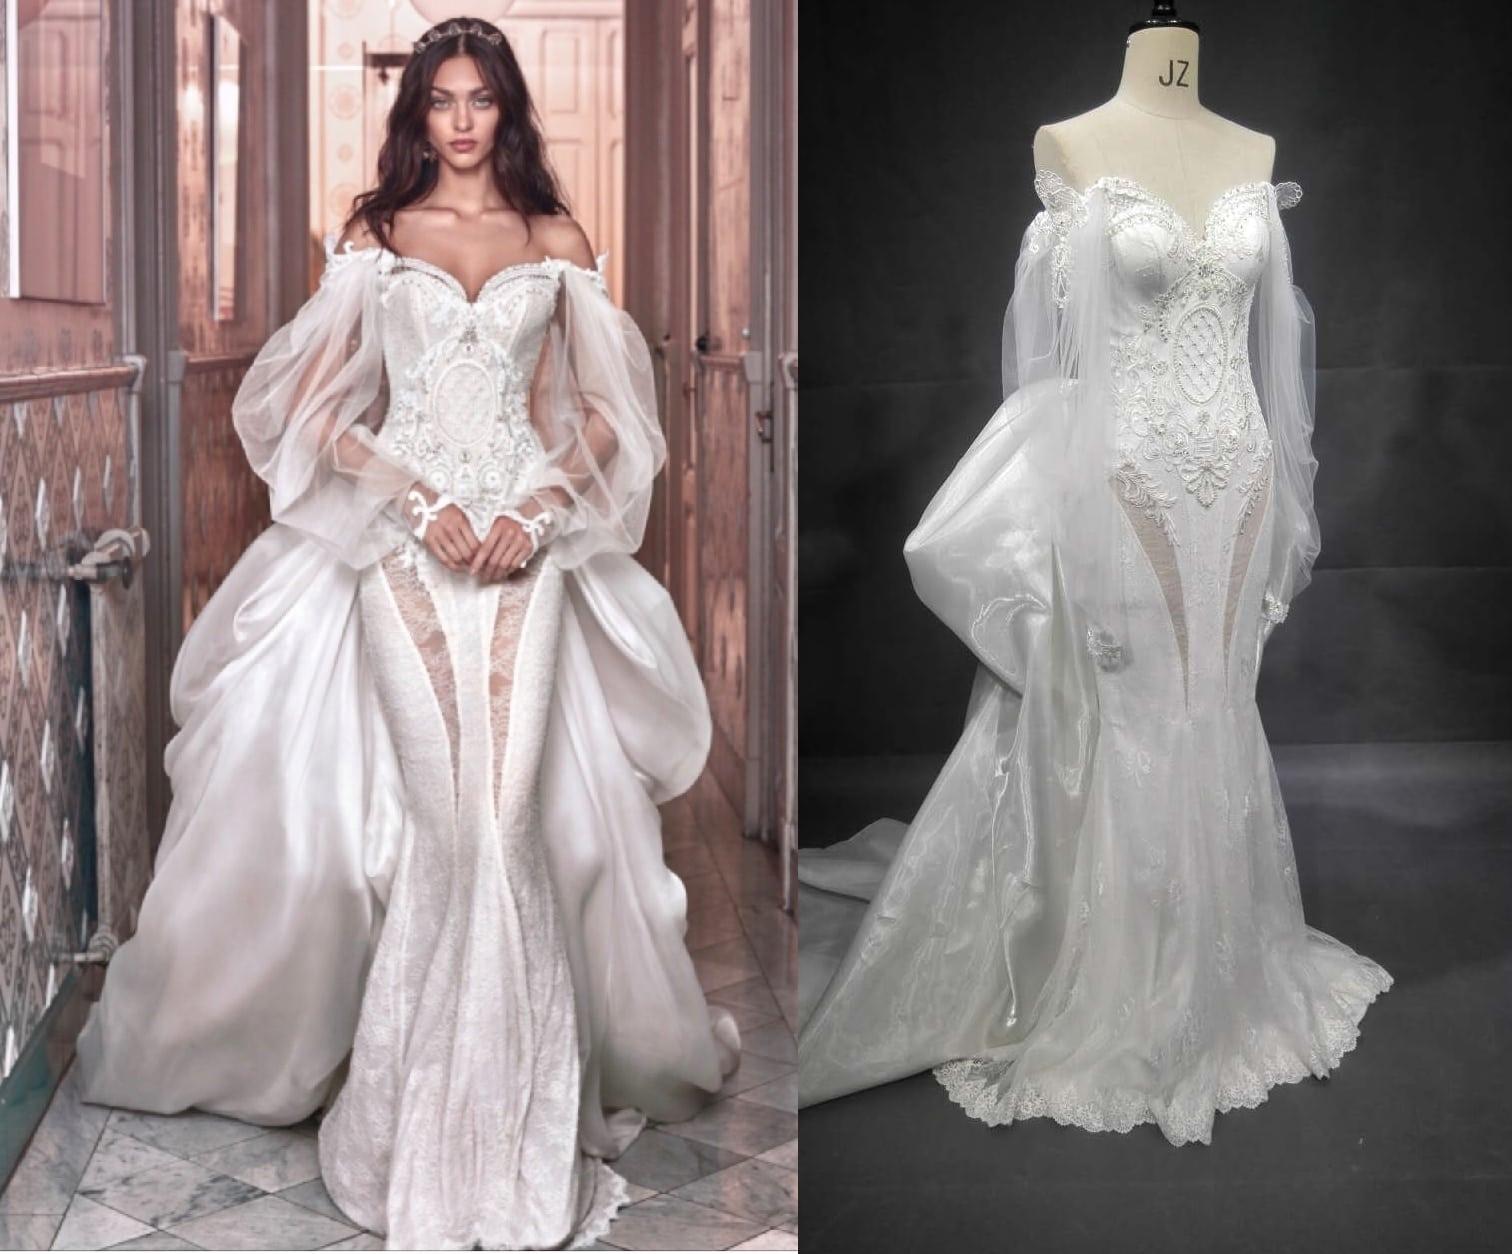 Galia Lahav Wedding Gowns: Replica Of Haute Couture Bridal Gown Design From Darius Bridal